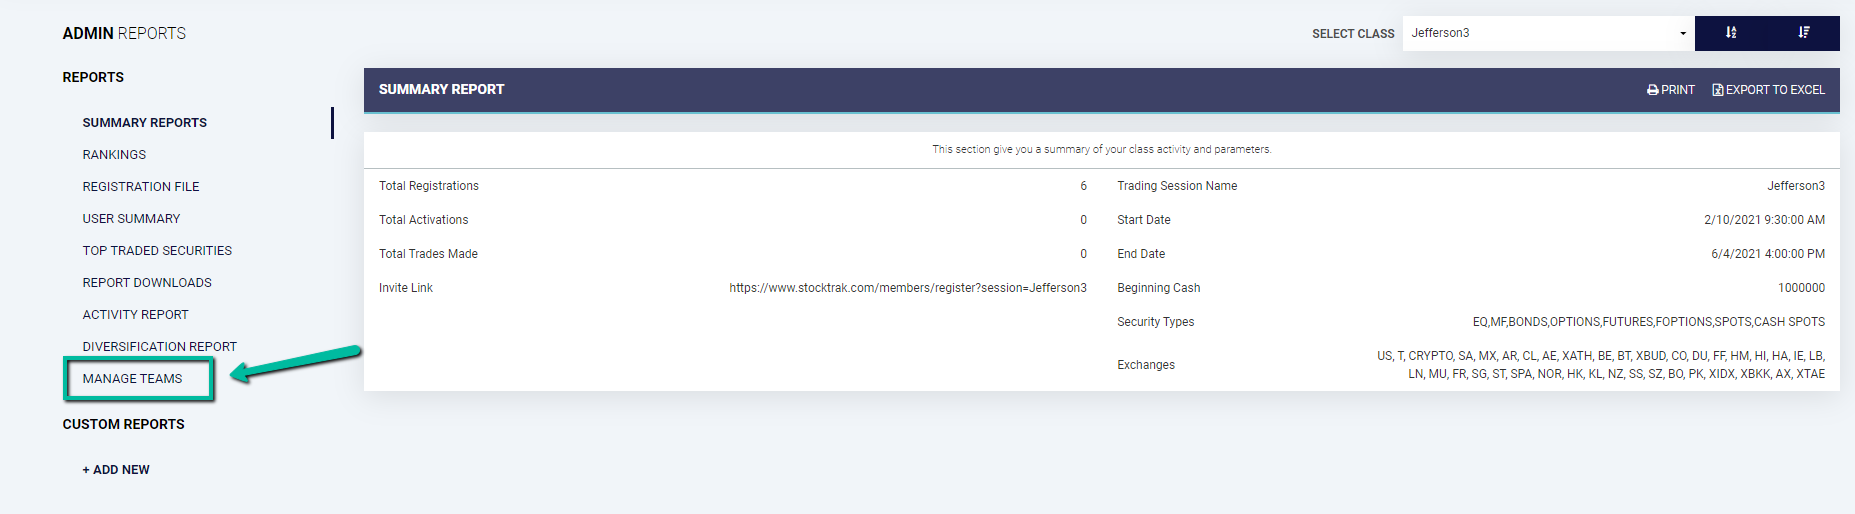 StockTrak Accessing Teams Management Page